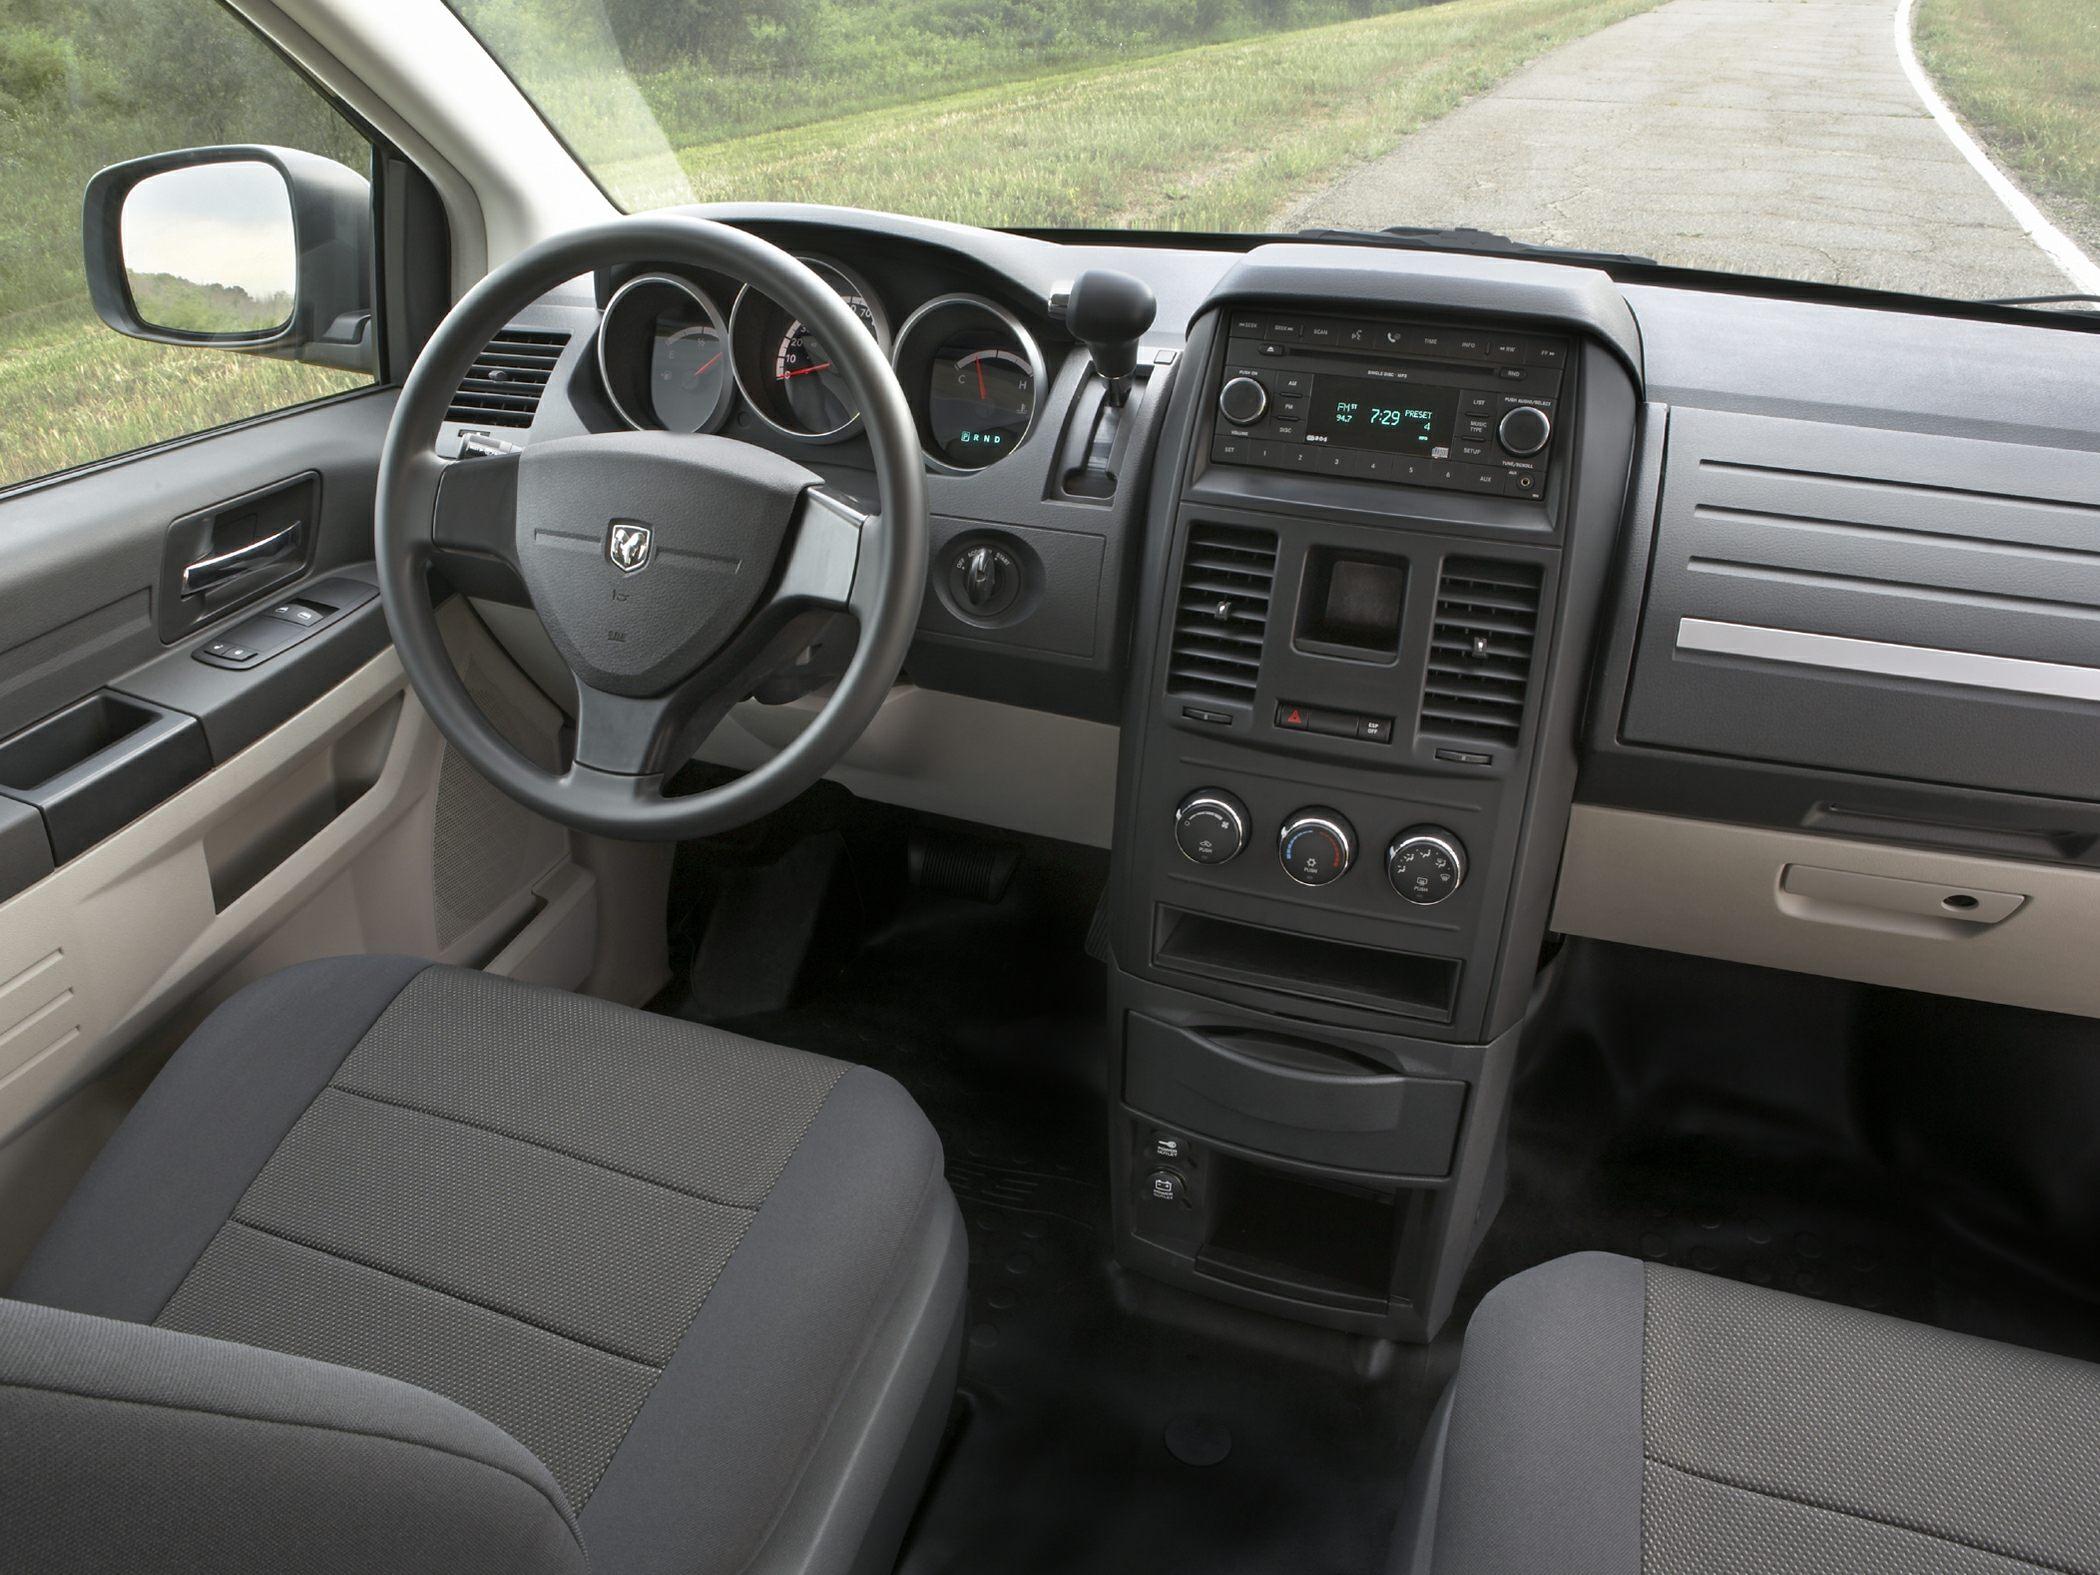 dodge grand caravan interior  2010 Dodge Grand Caravan - Price, Photos, Reviews & Features - dodge grand caravan interior